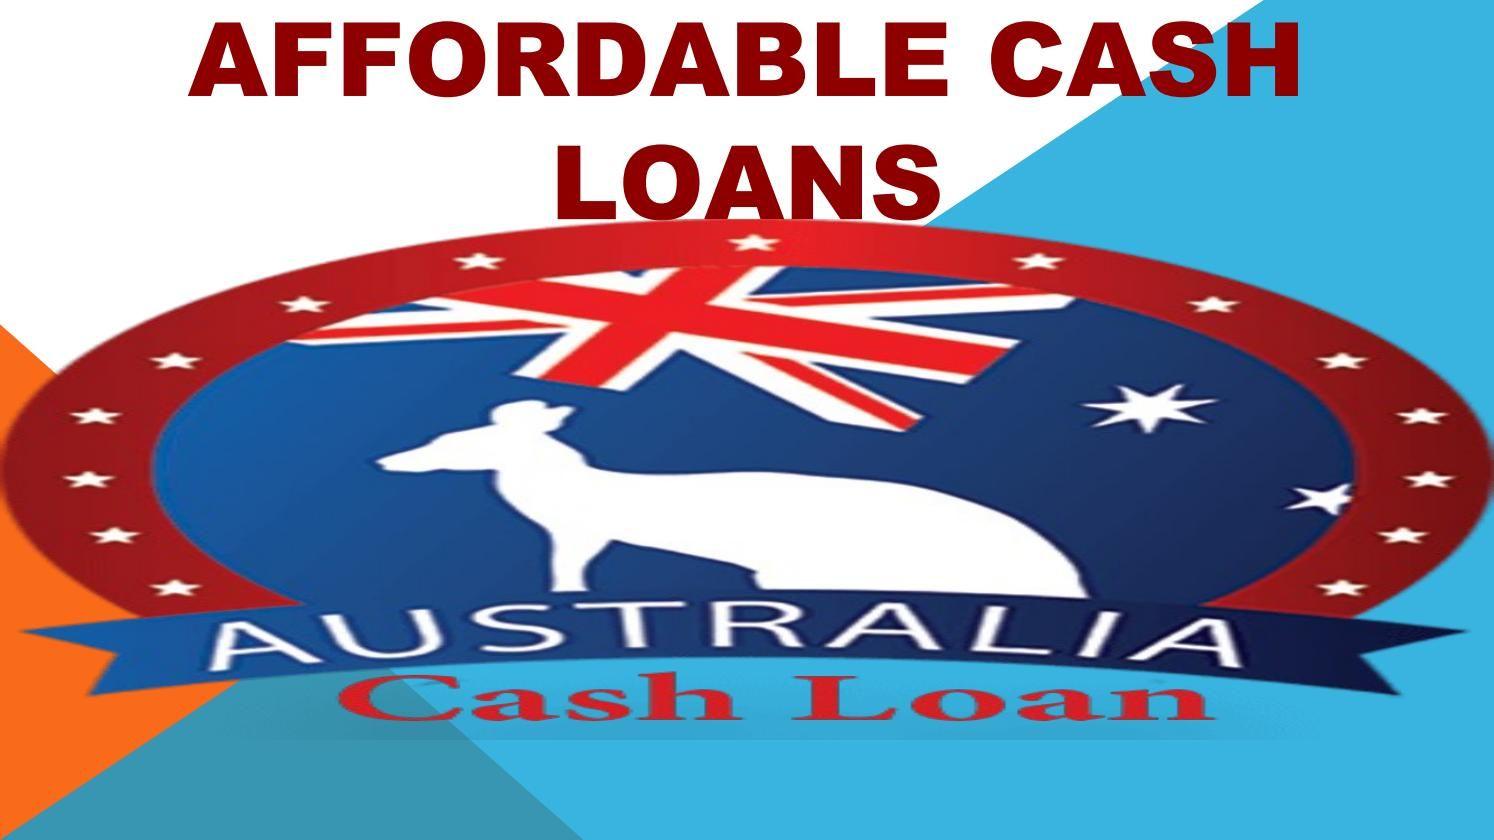 Payday loans in atlanta image 5